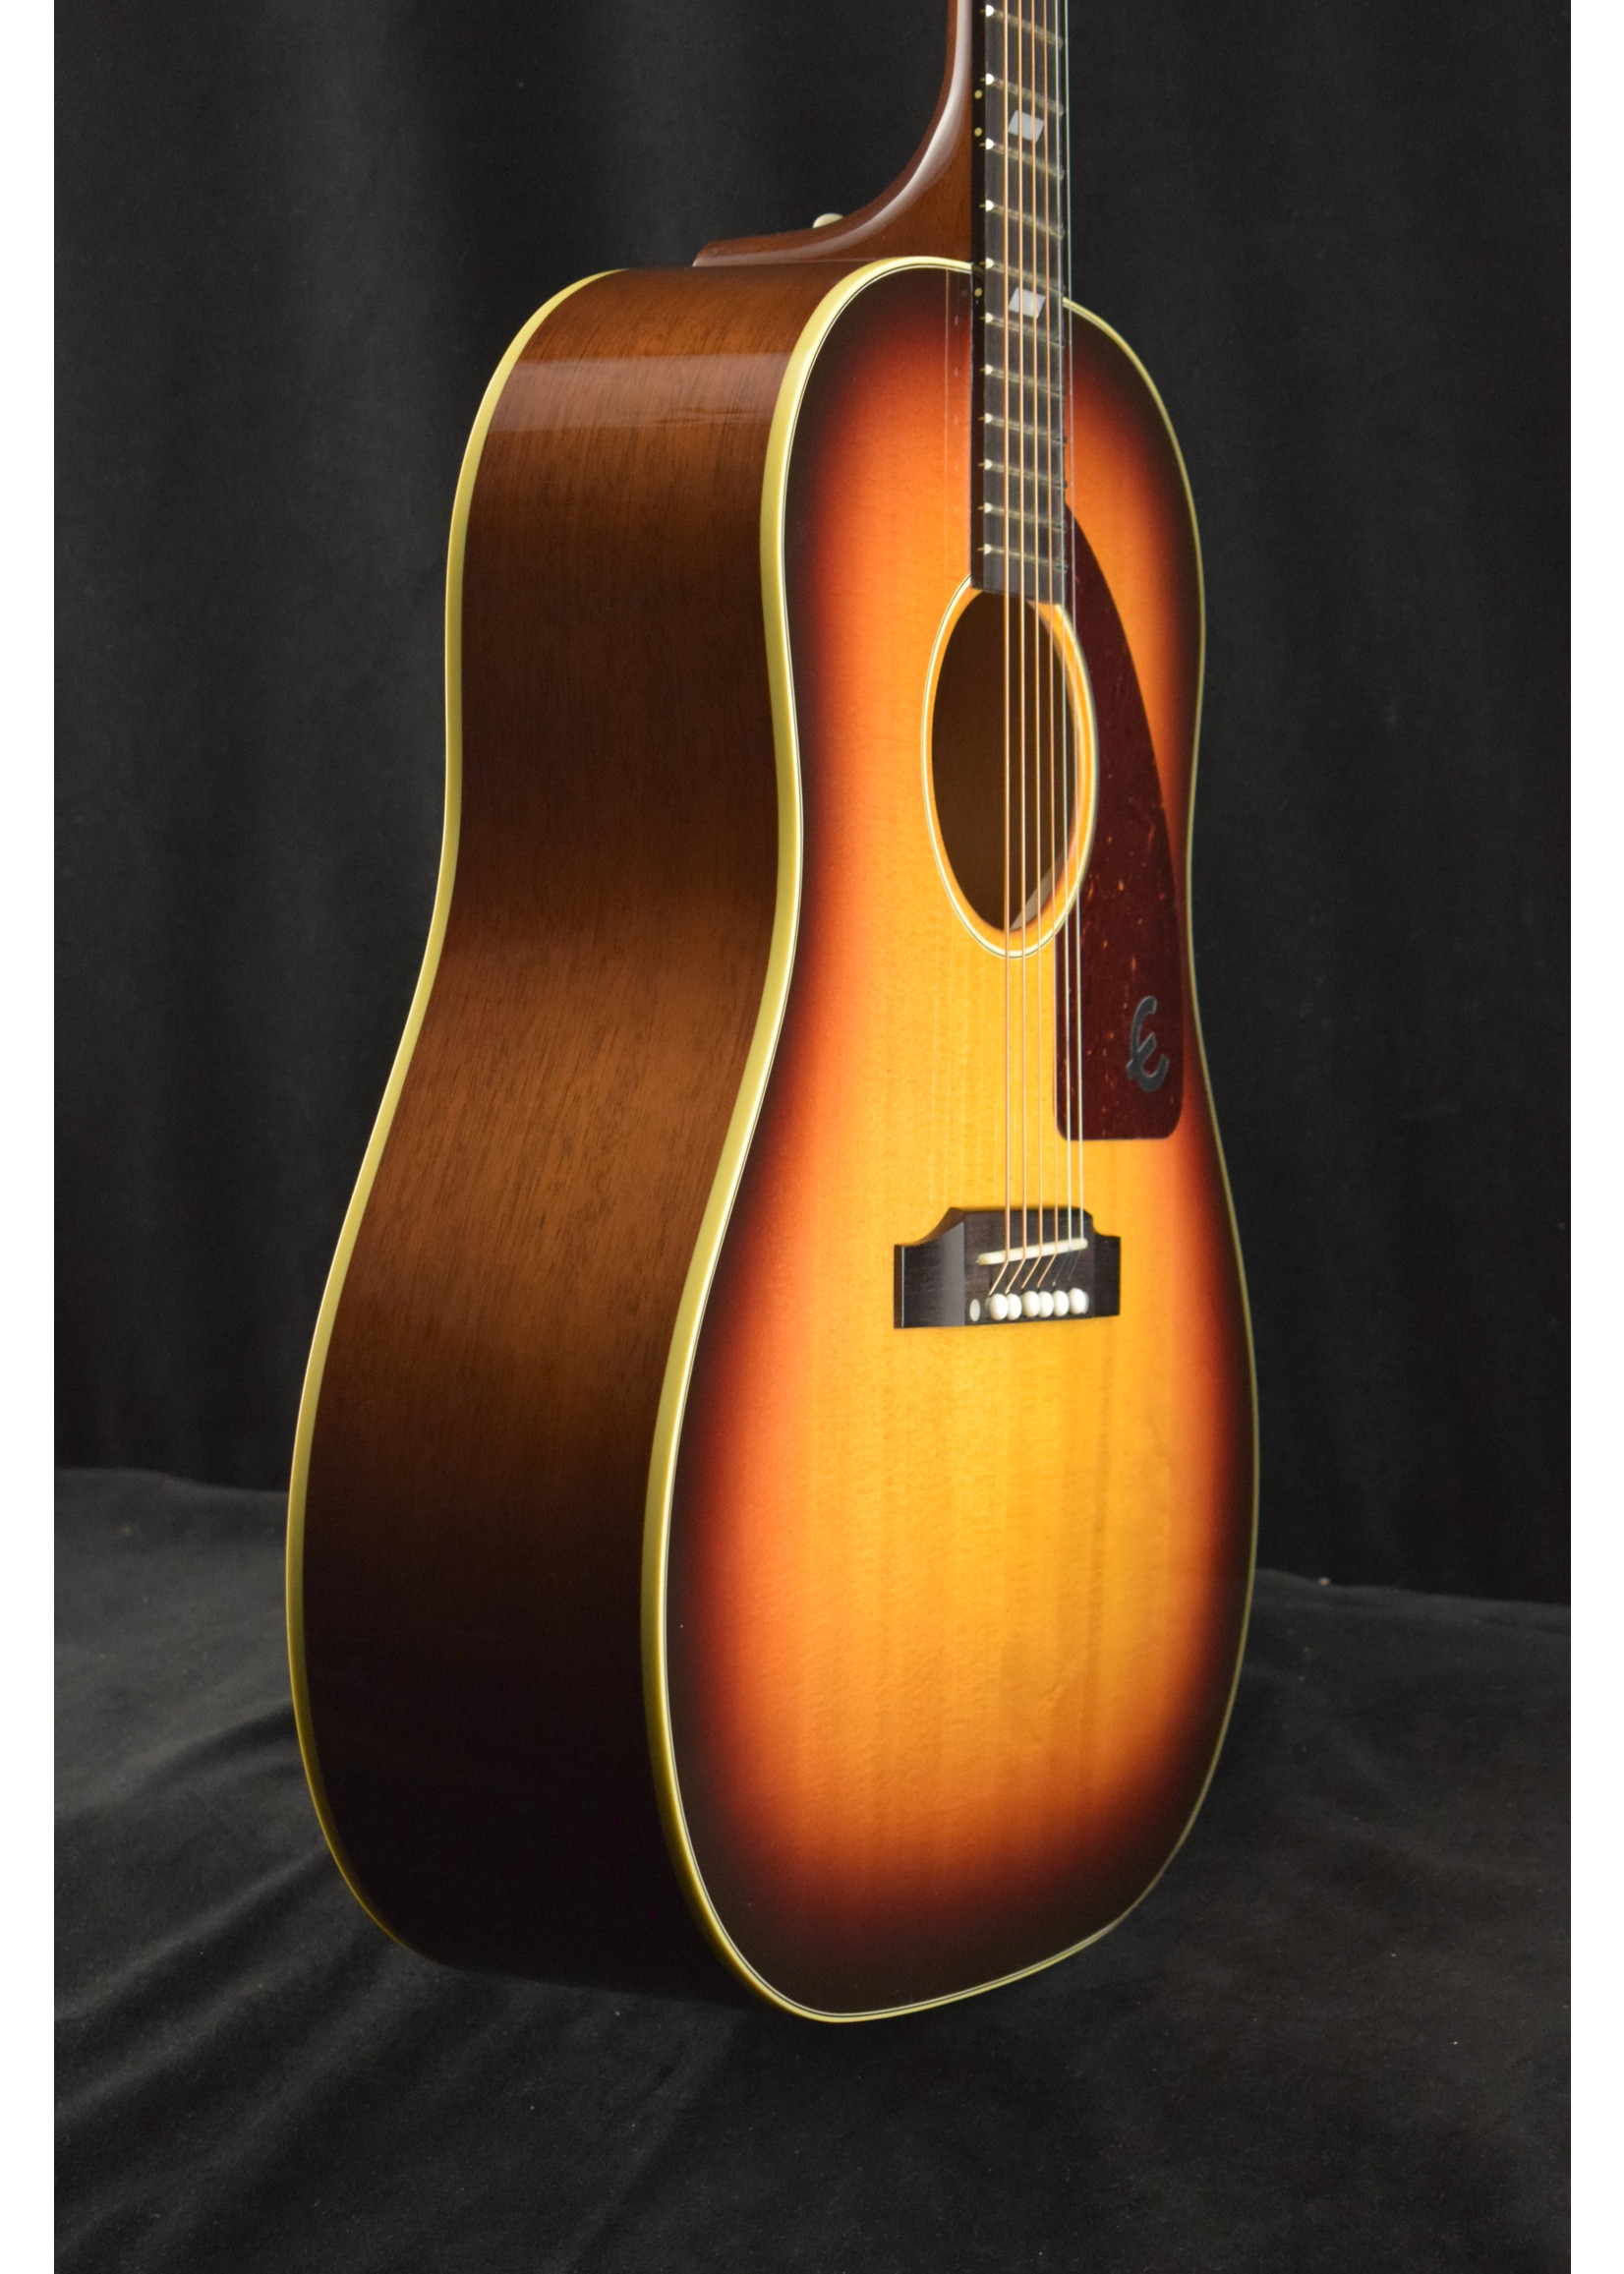 Epiphone Epiphone Texan (Gibson USA) Vintage Sunburst